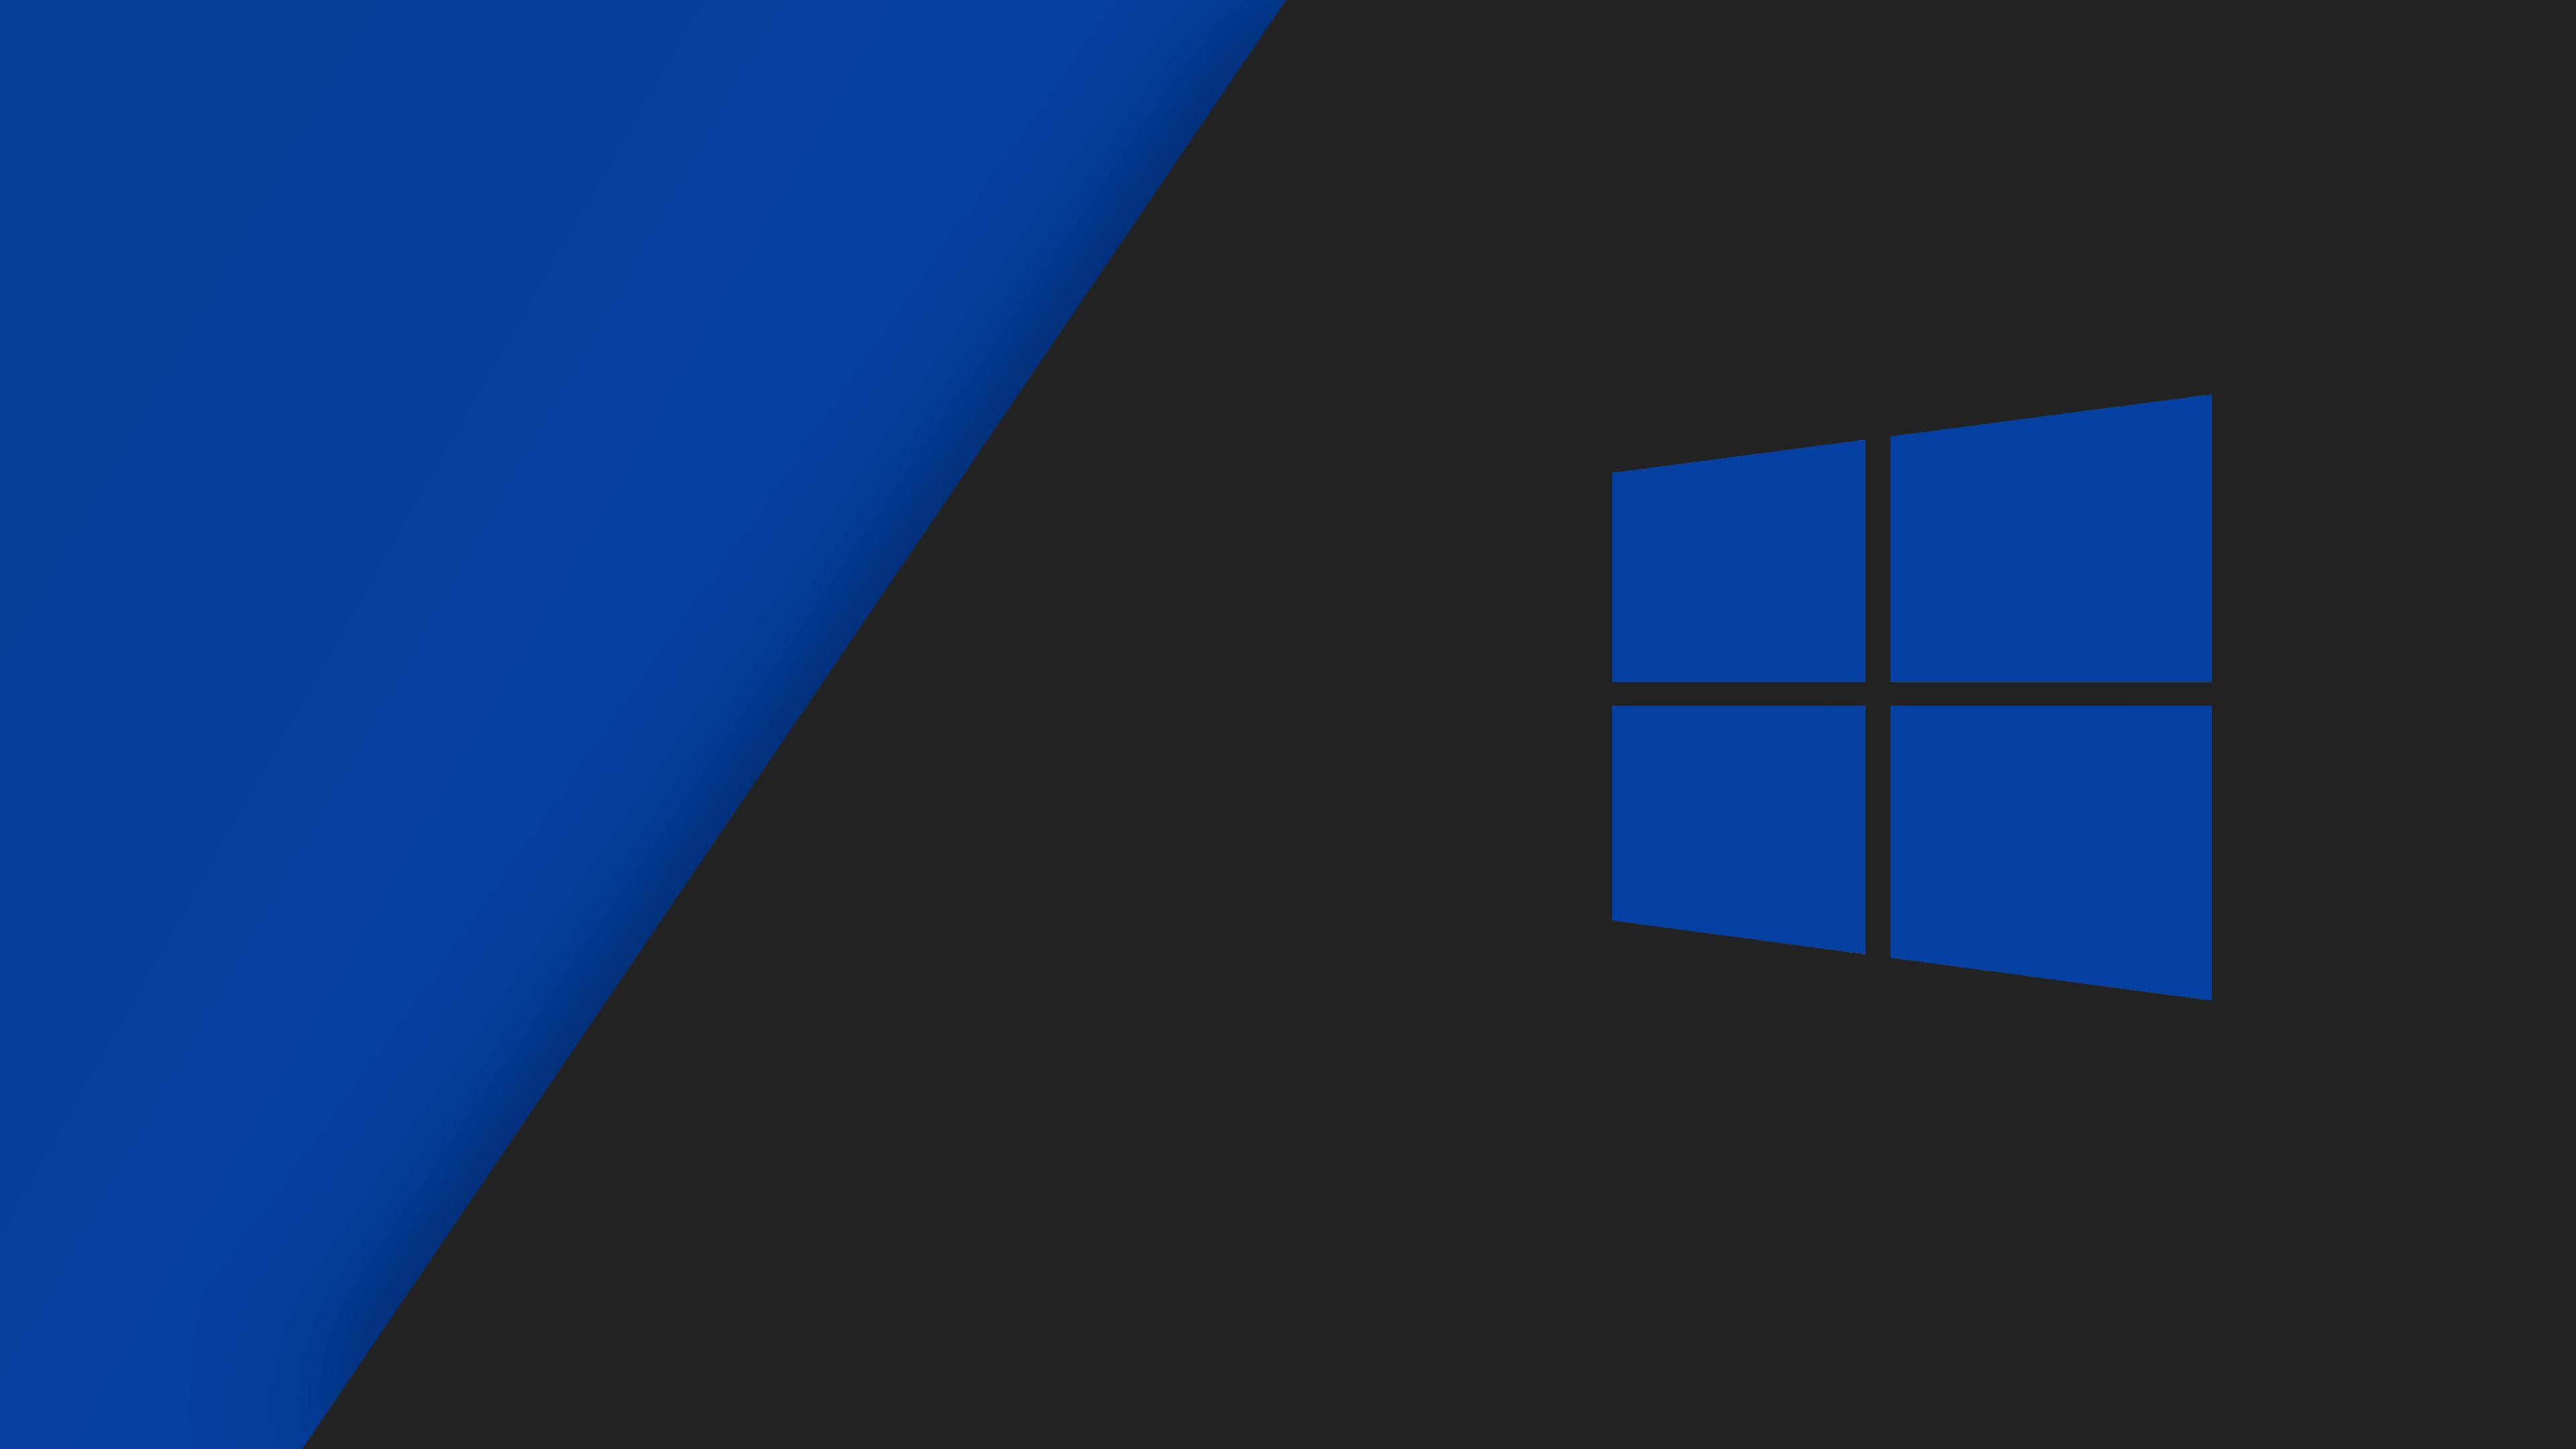 Cool Windows 10 Hd Wallpapers Windows 4k Desktop Background 3840x2160 Download Hd Wallpaper Wallpapertip